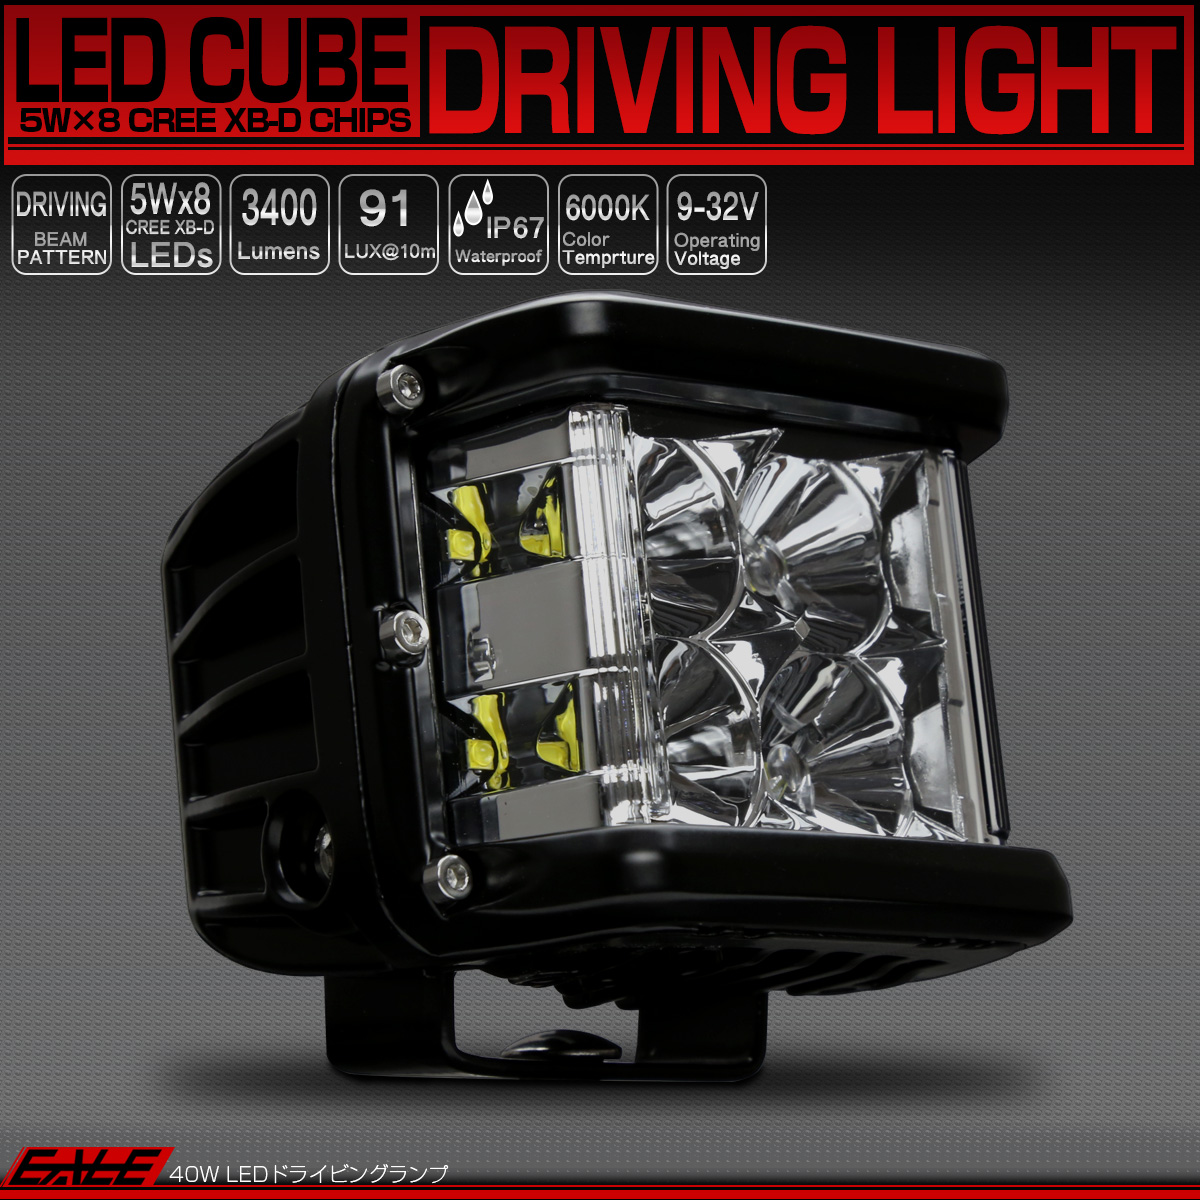 LED ドライビングランプ DRIVING LIGHT CUBE 40W CREE XB-D 12V 24V フォグランプ P-499